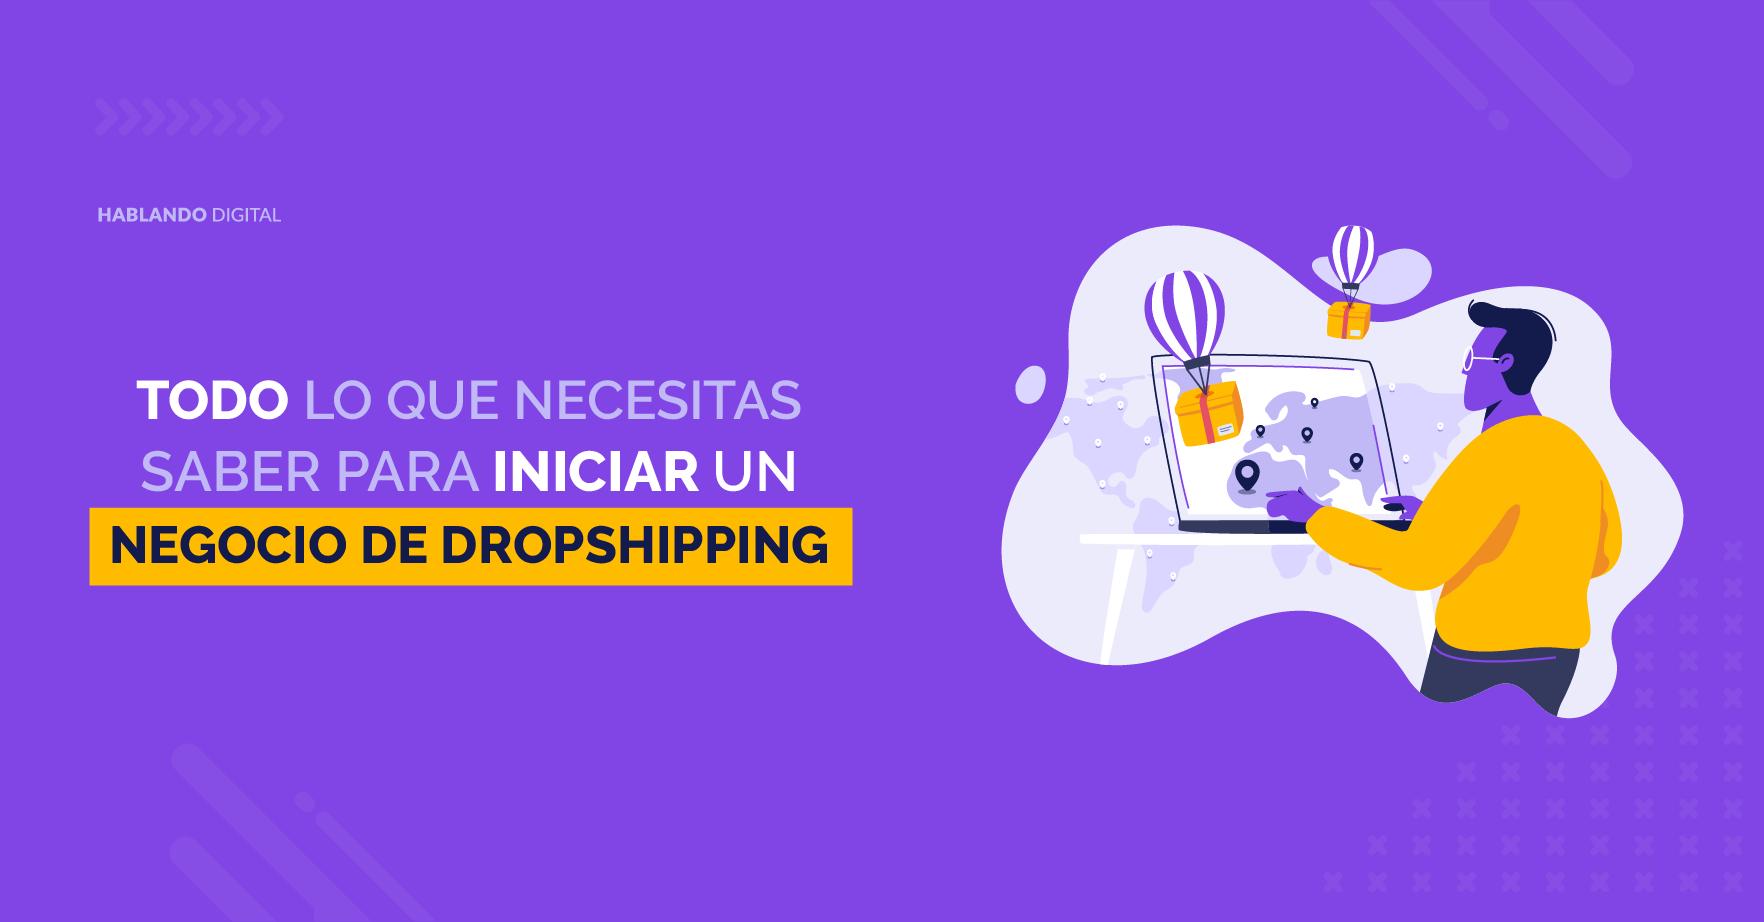 Todo lo que necesitas saber para empezar un negocio de Dropshipping